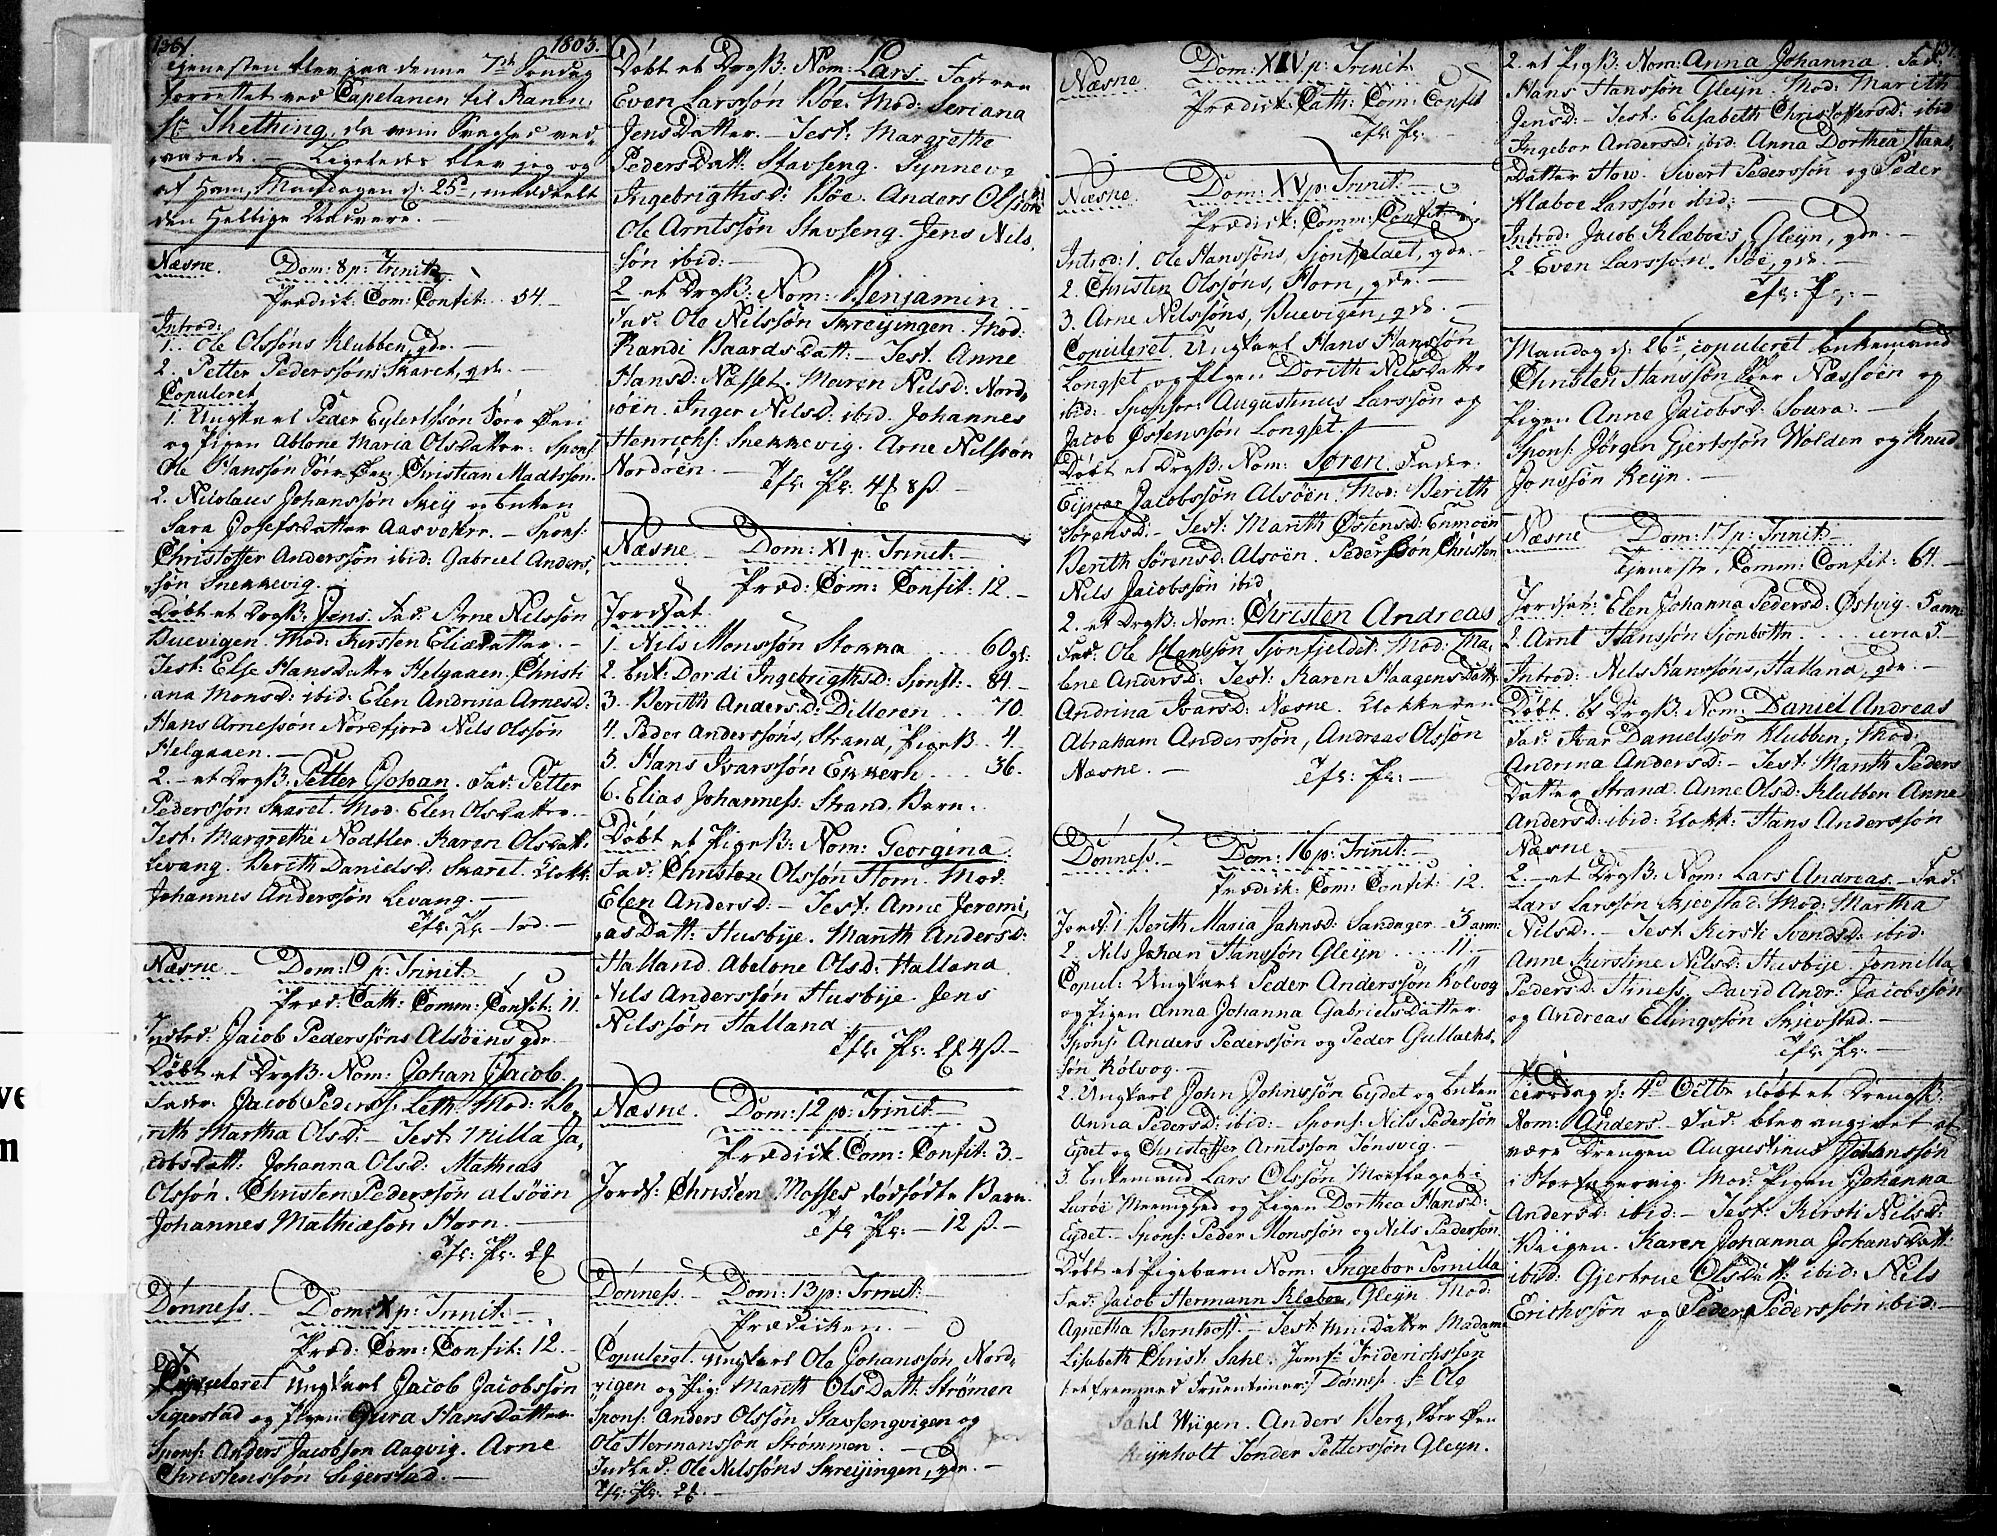 SAT, Ministerialprotokoller, klokkerbøker og fødselsregistre - Nordland, 838/L0545: Ministerialbok nr. 838A04, 1791-1820, s. 136-137